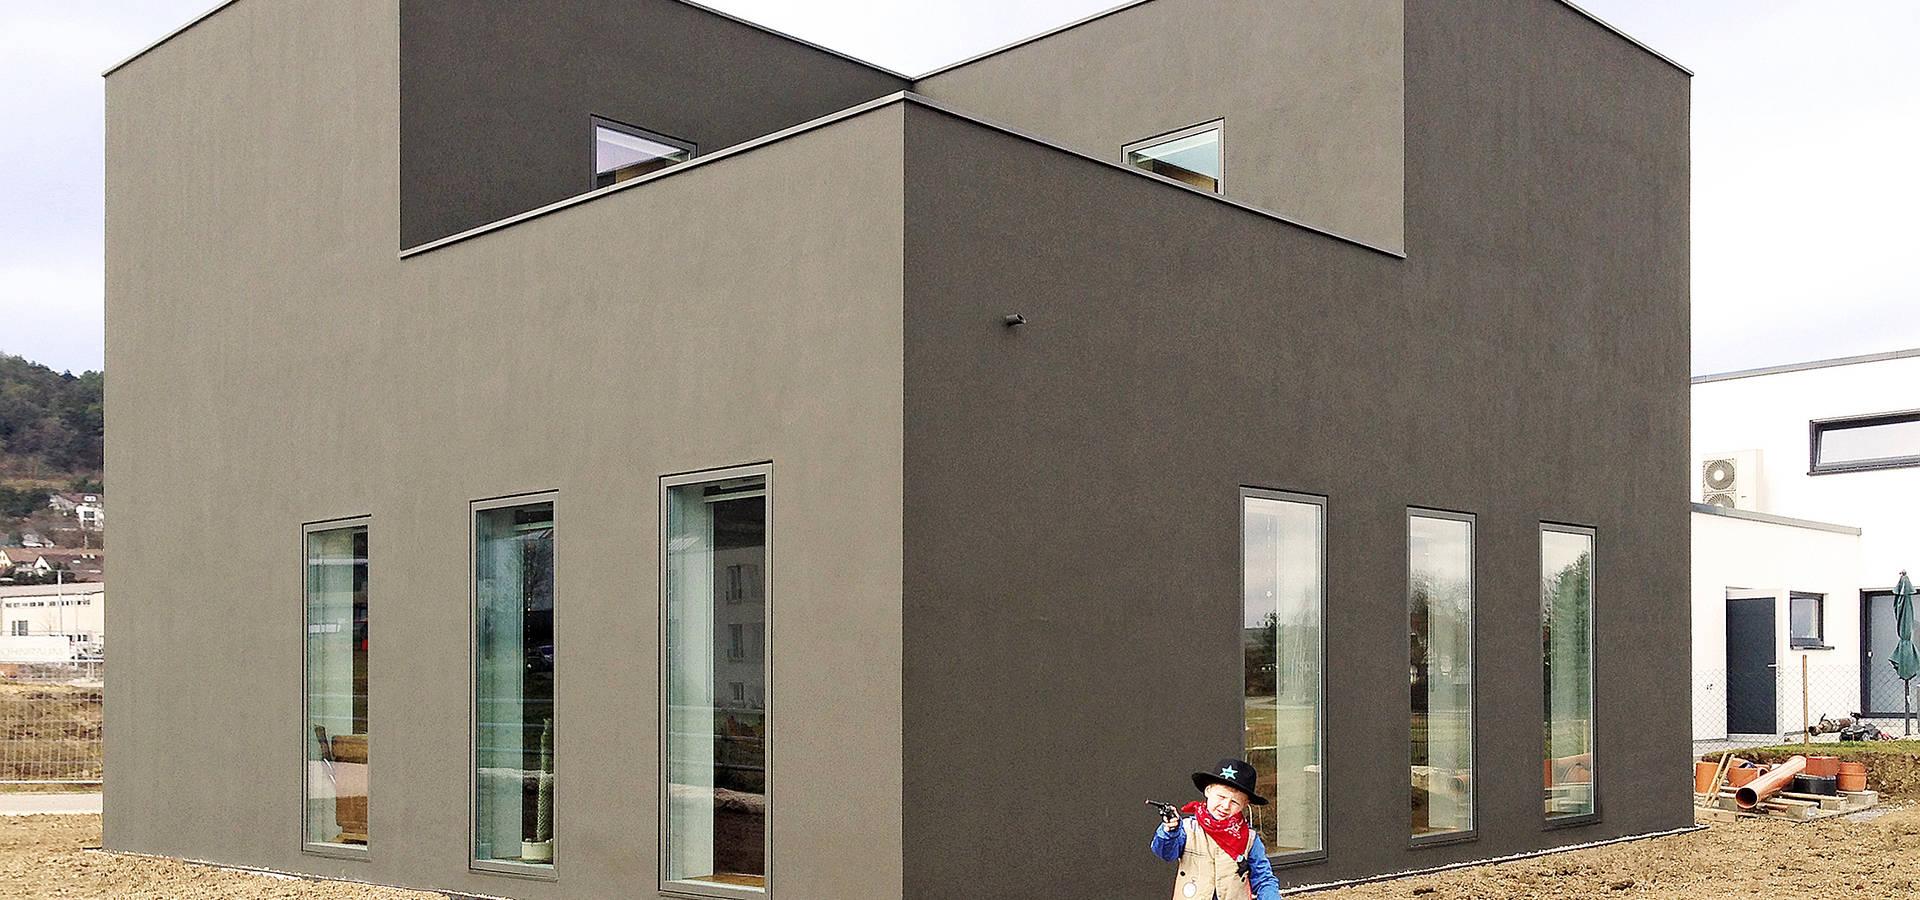 f m b architekten – Norman Binder & Andreas-Thomas Mayer